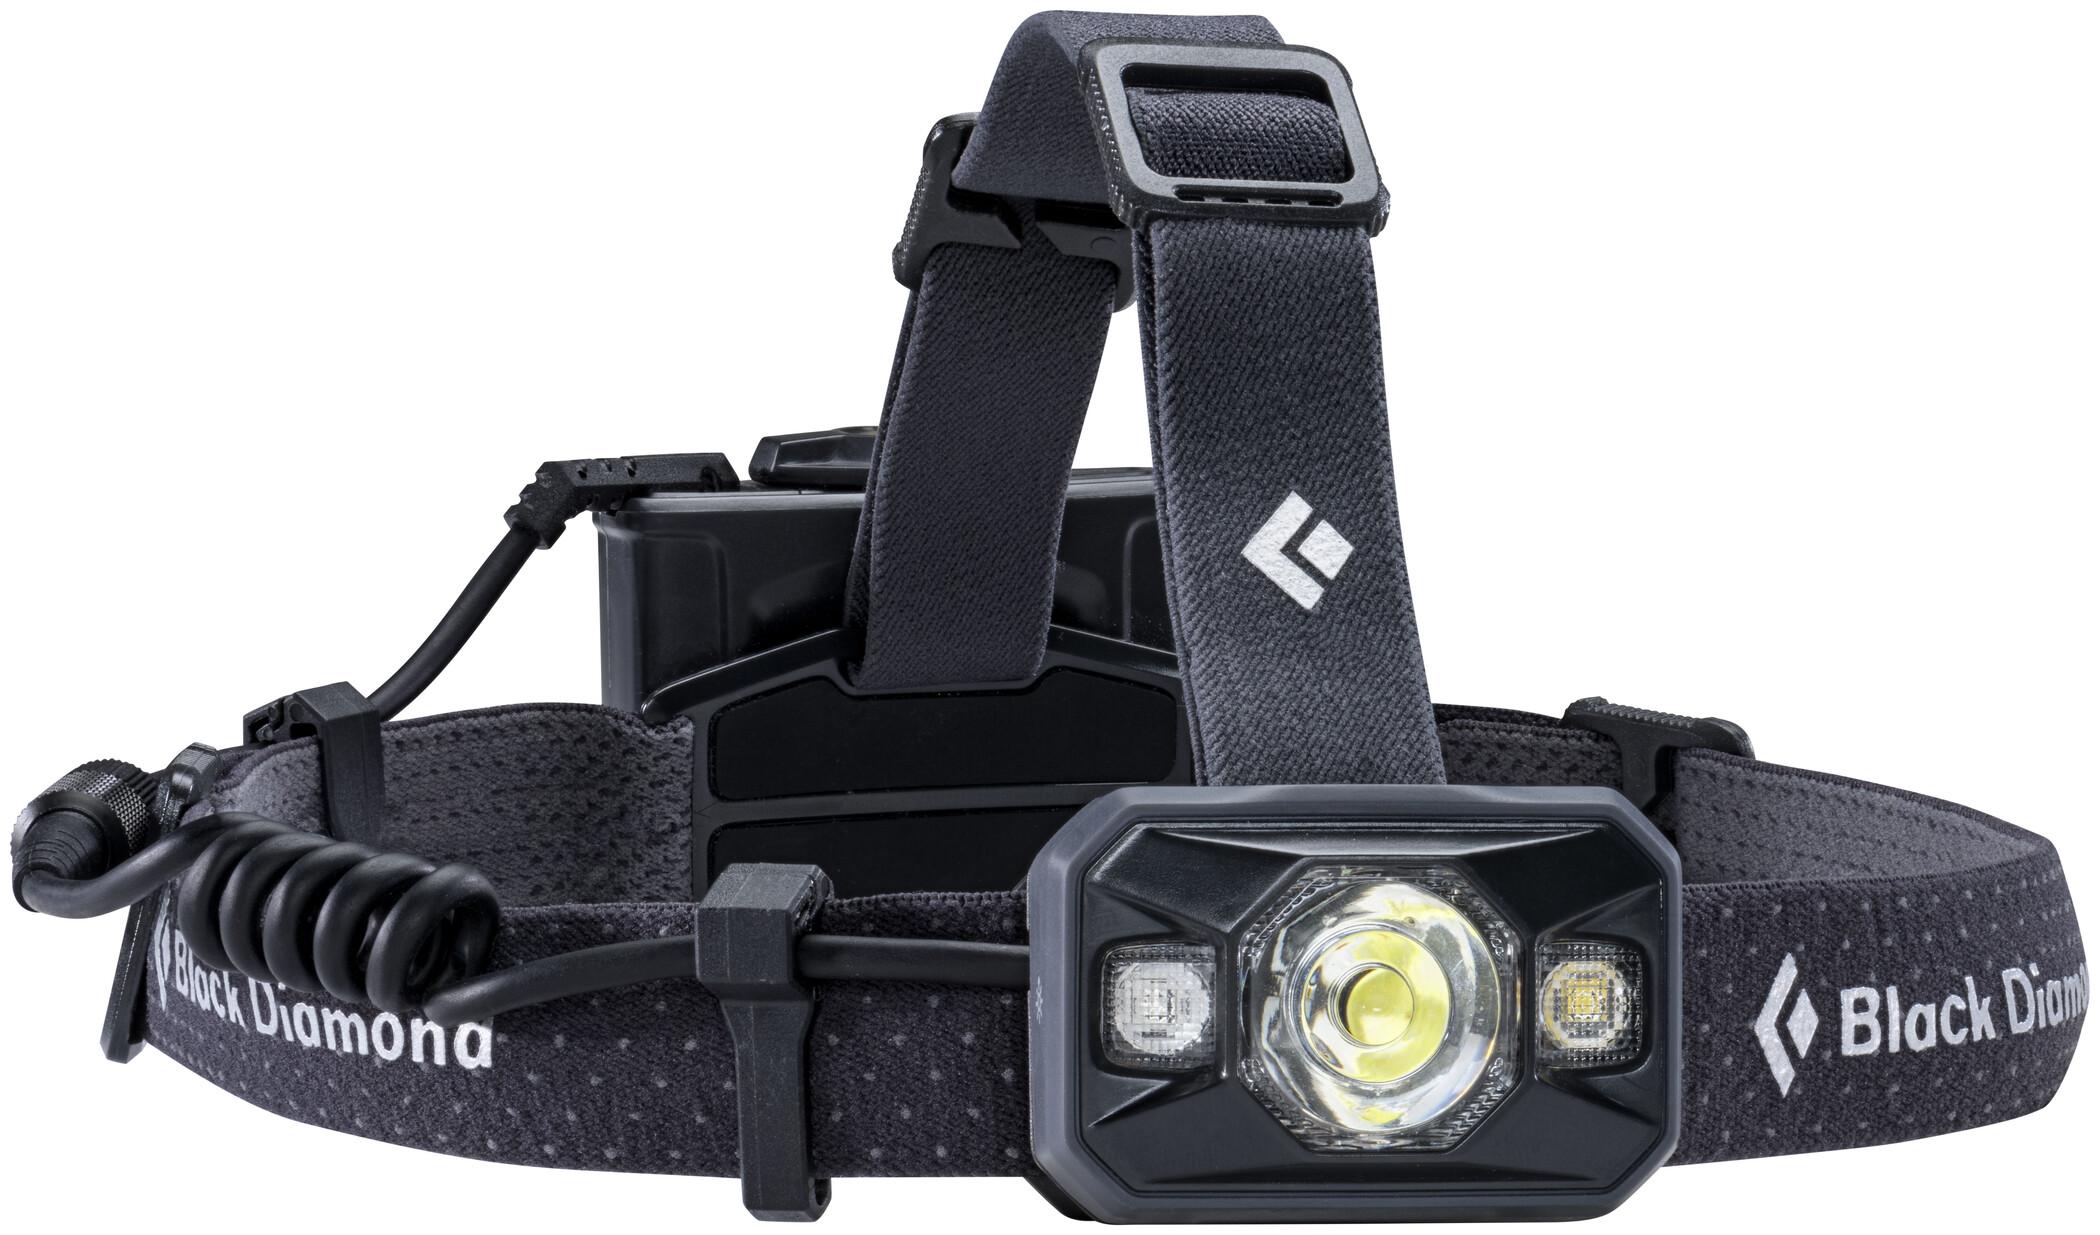 Black Diamond Icon Pandelampe, black (2019) | Headlamp